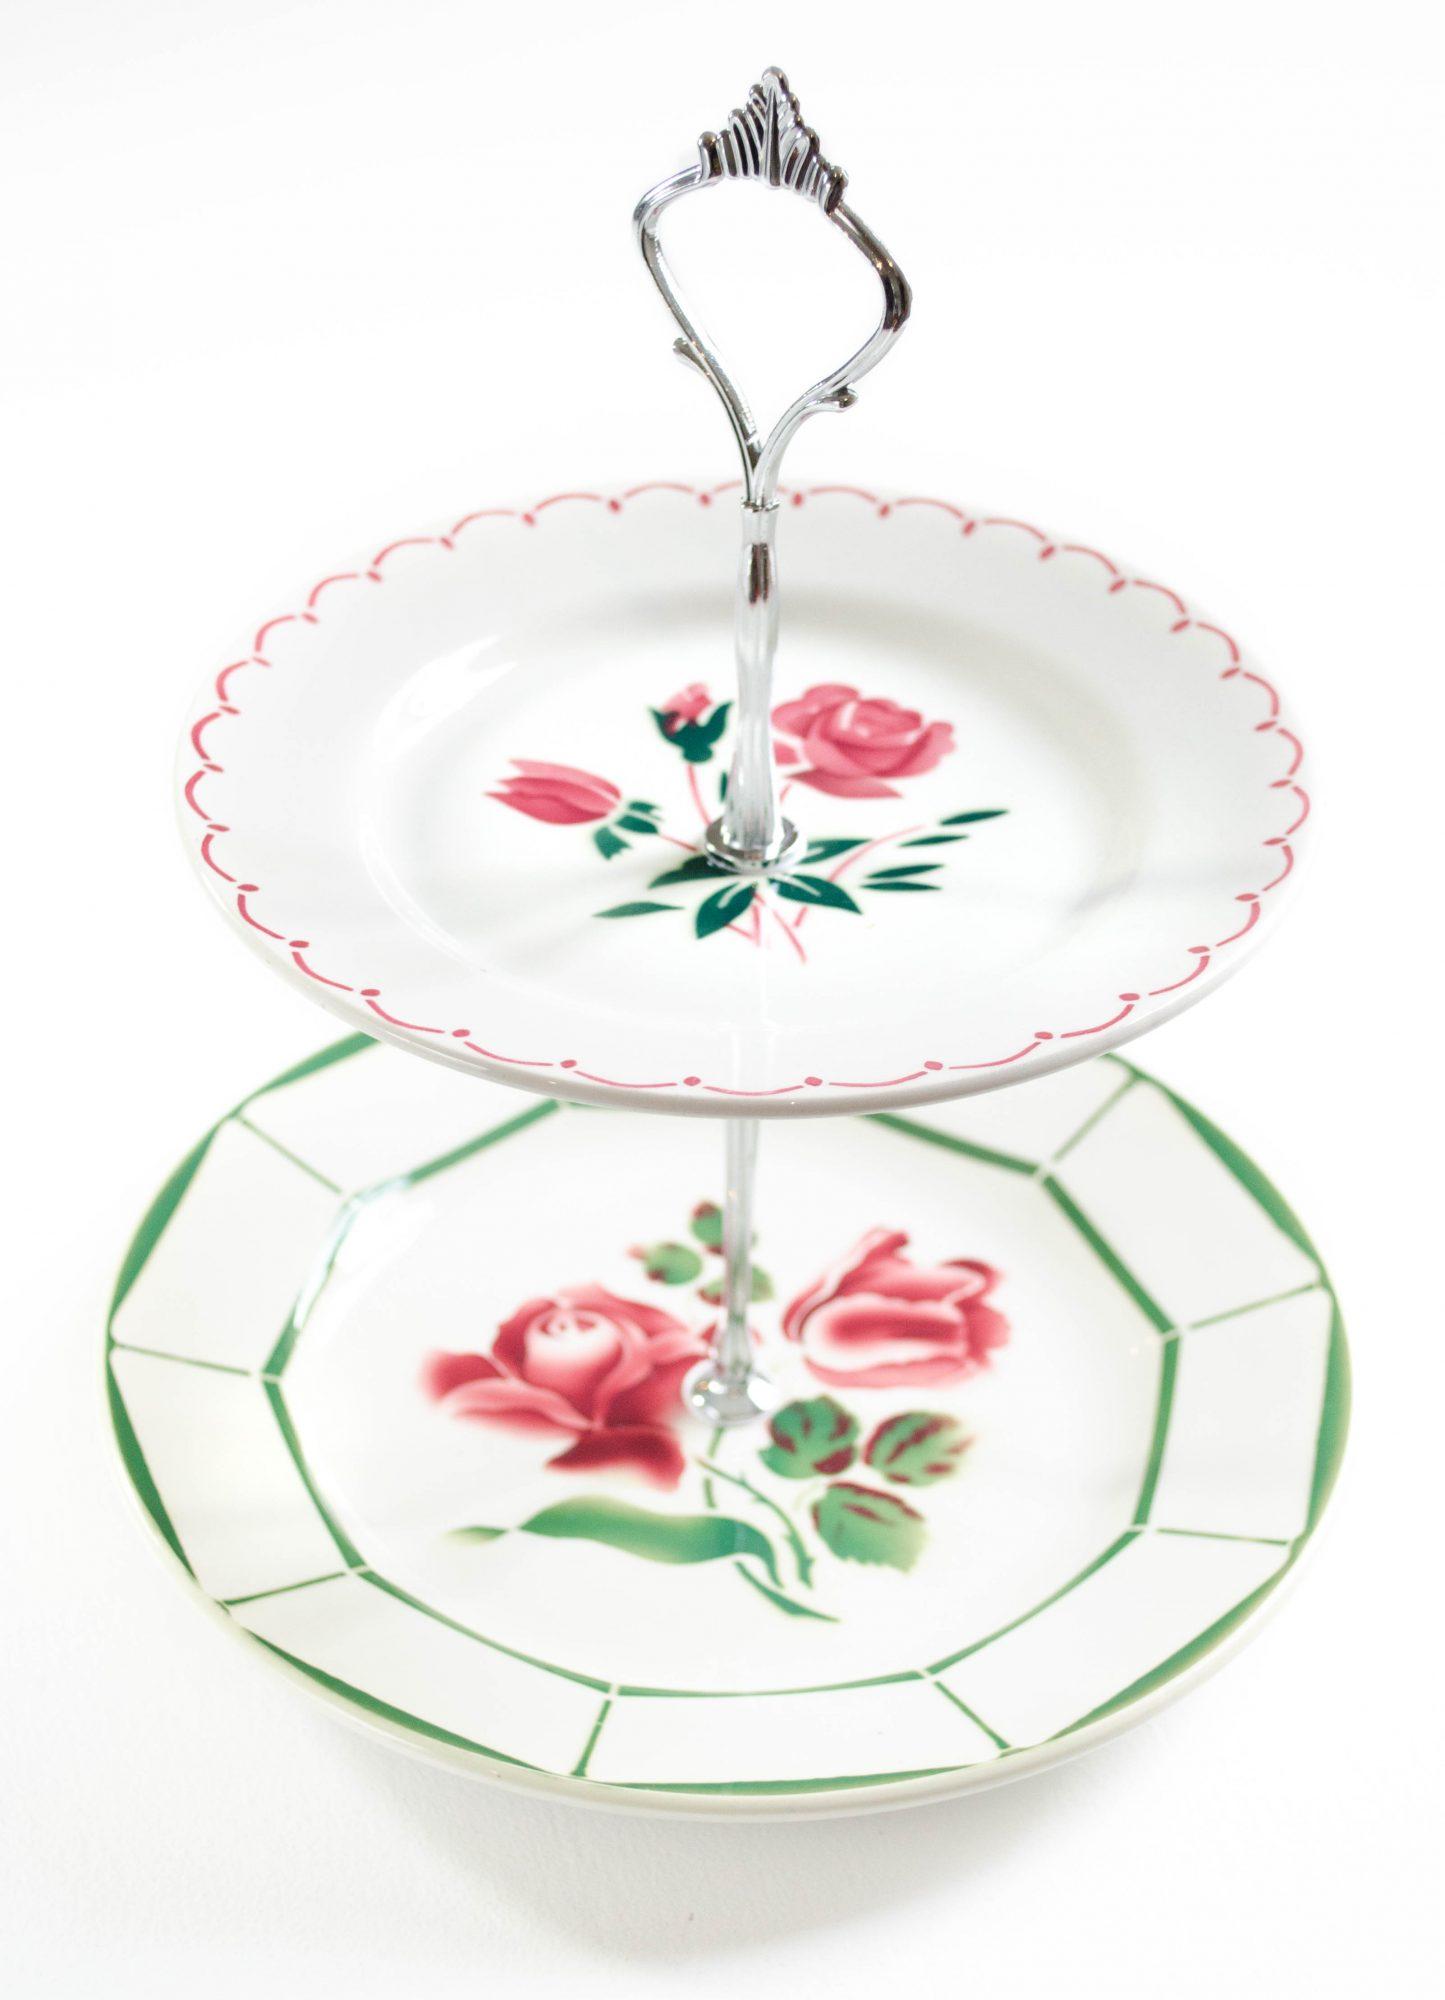 cakestand faience badonviller digoin sarreguemines assiettes roses